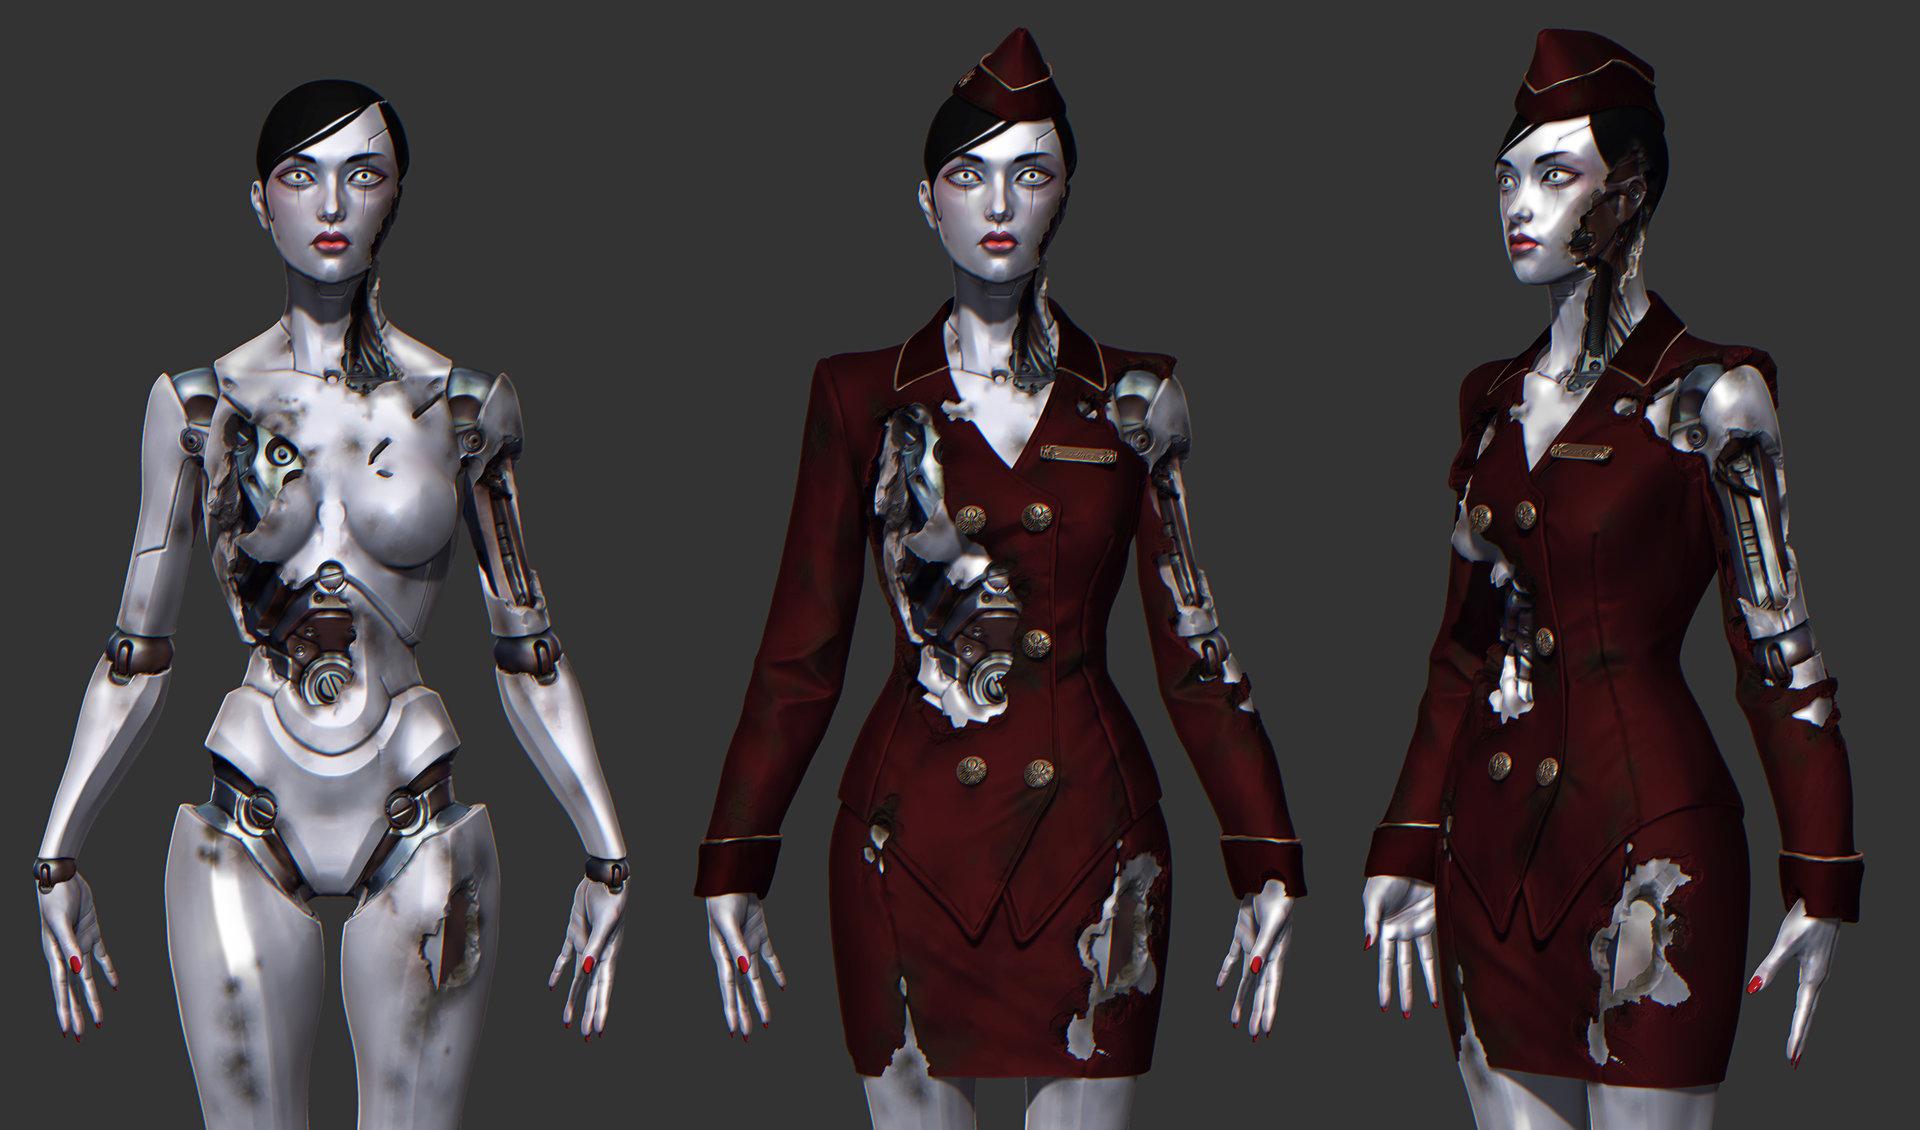 David giraud training dolly concept update2